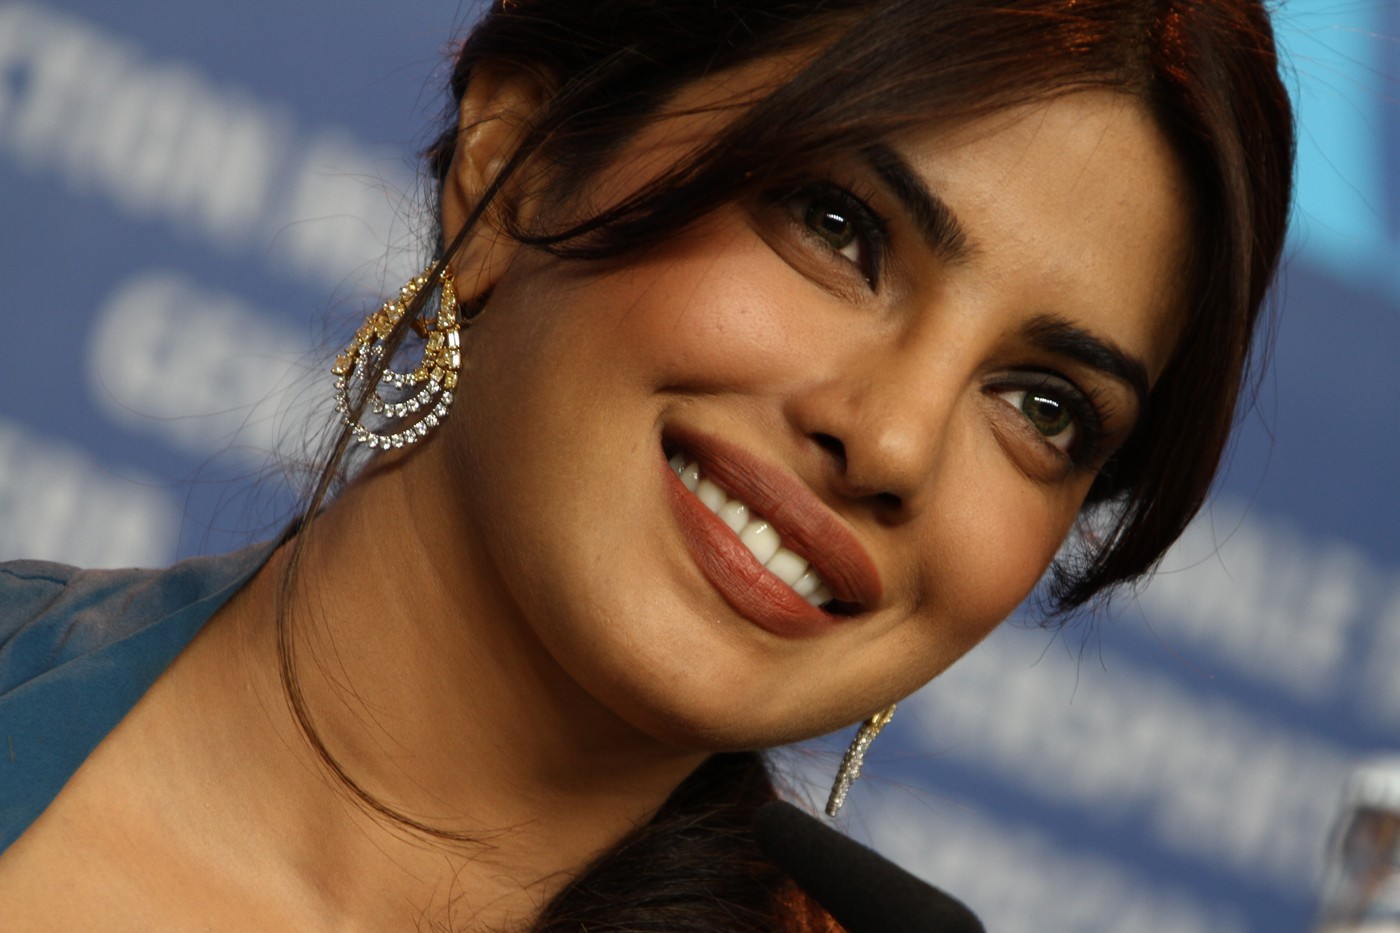 Indian Superstar Priyanka Chopra